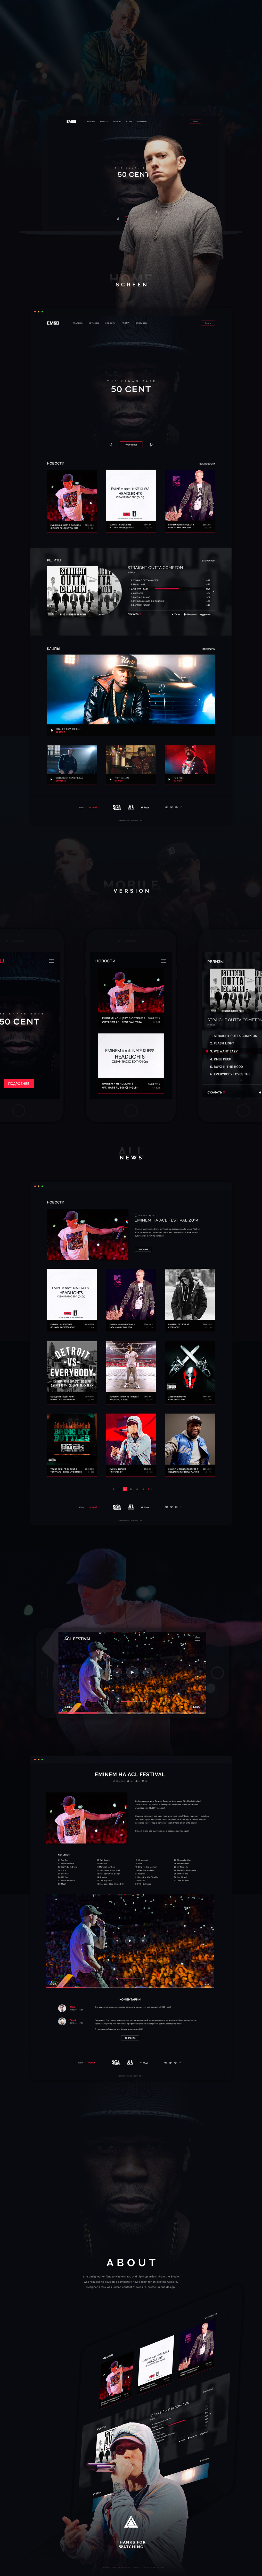 site hip hop rap artist Label eminem 50 cent media news relise video Album design Interface brand